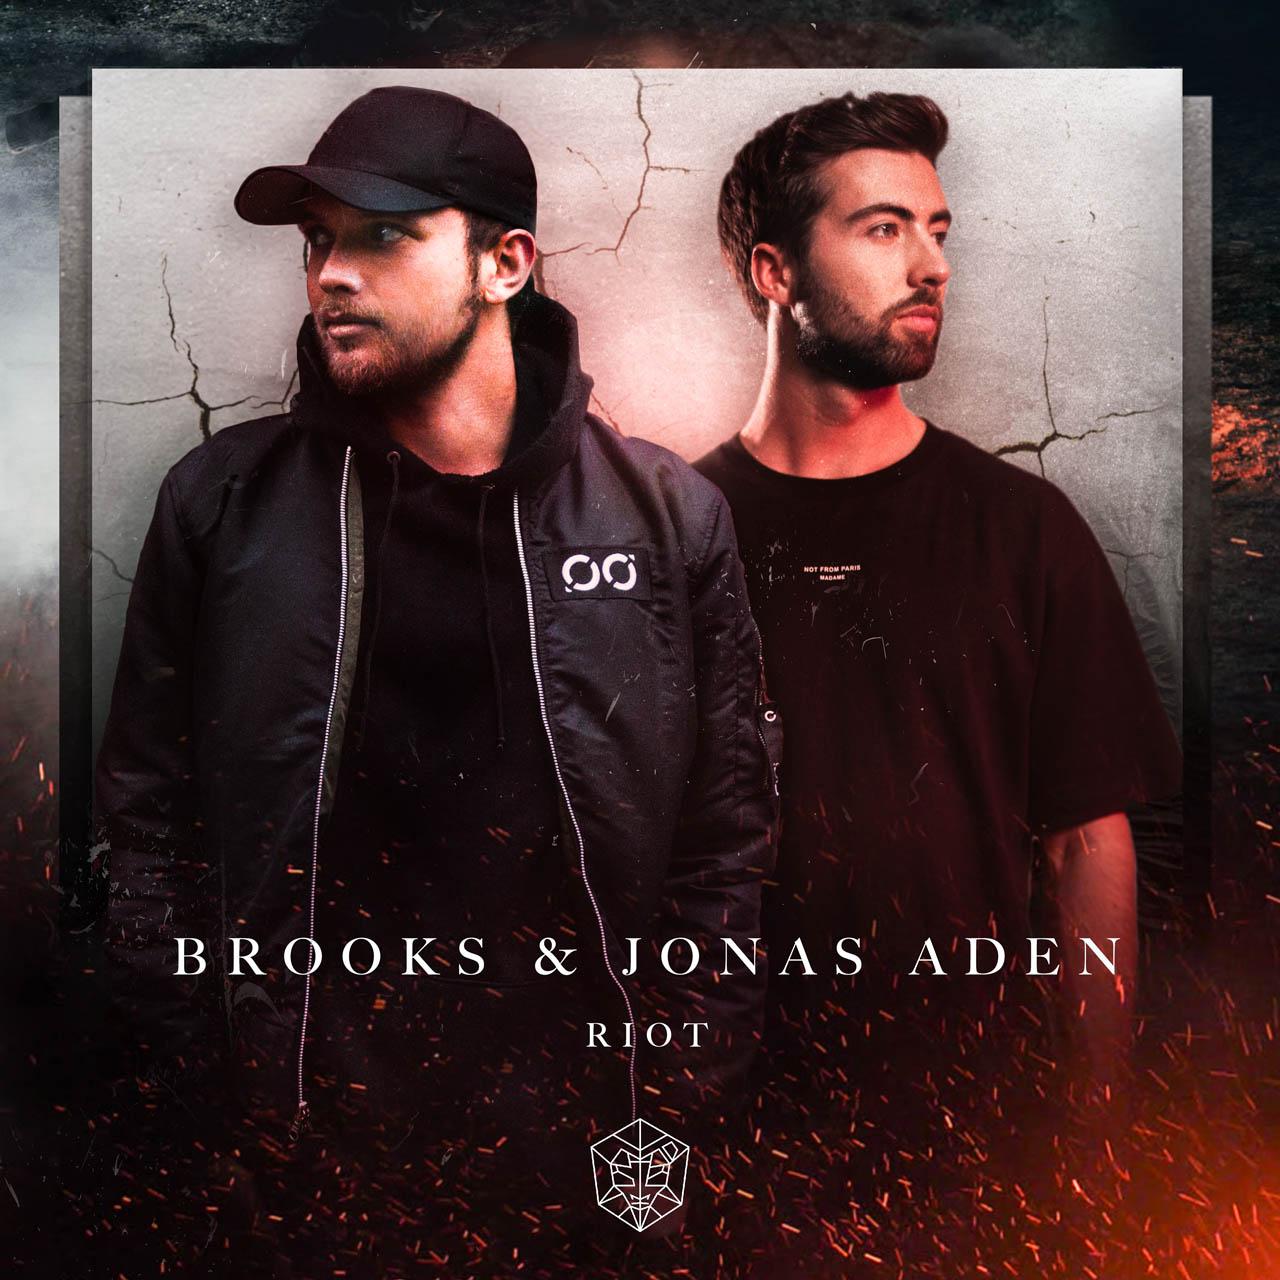 Brooks and Jonas Aden - Riot